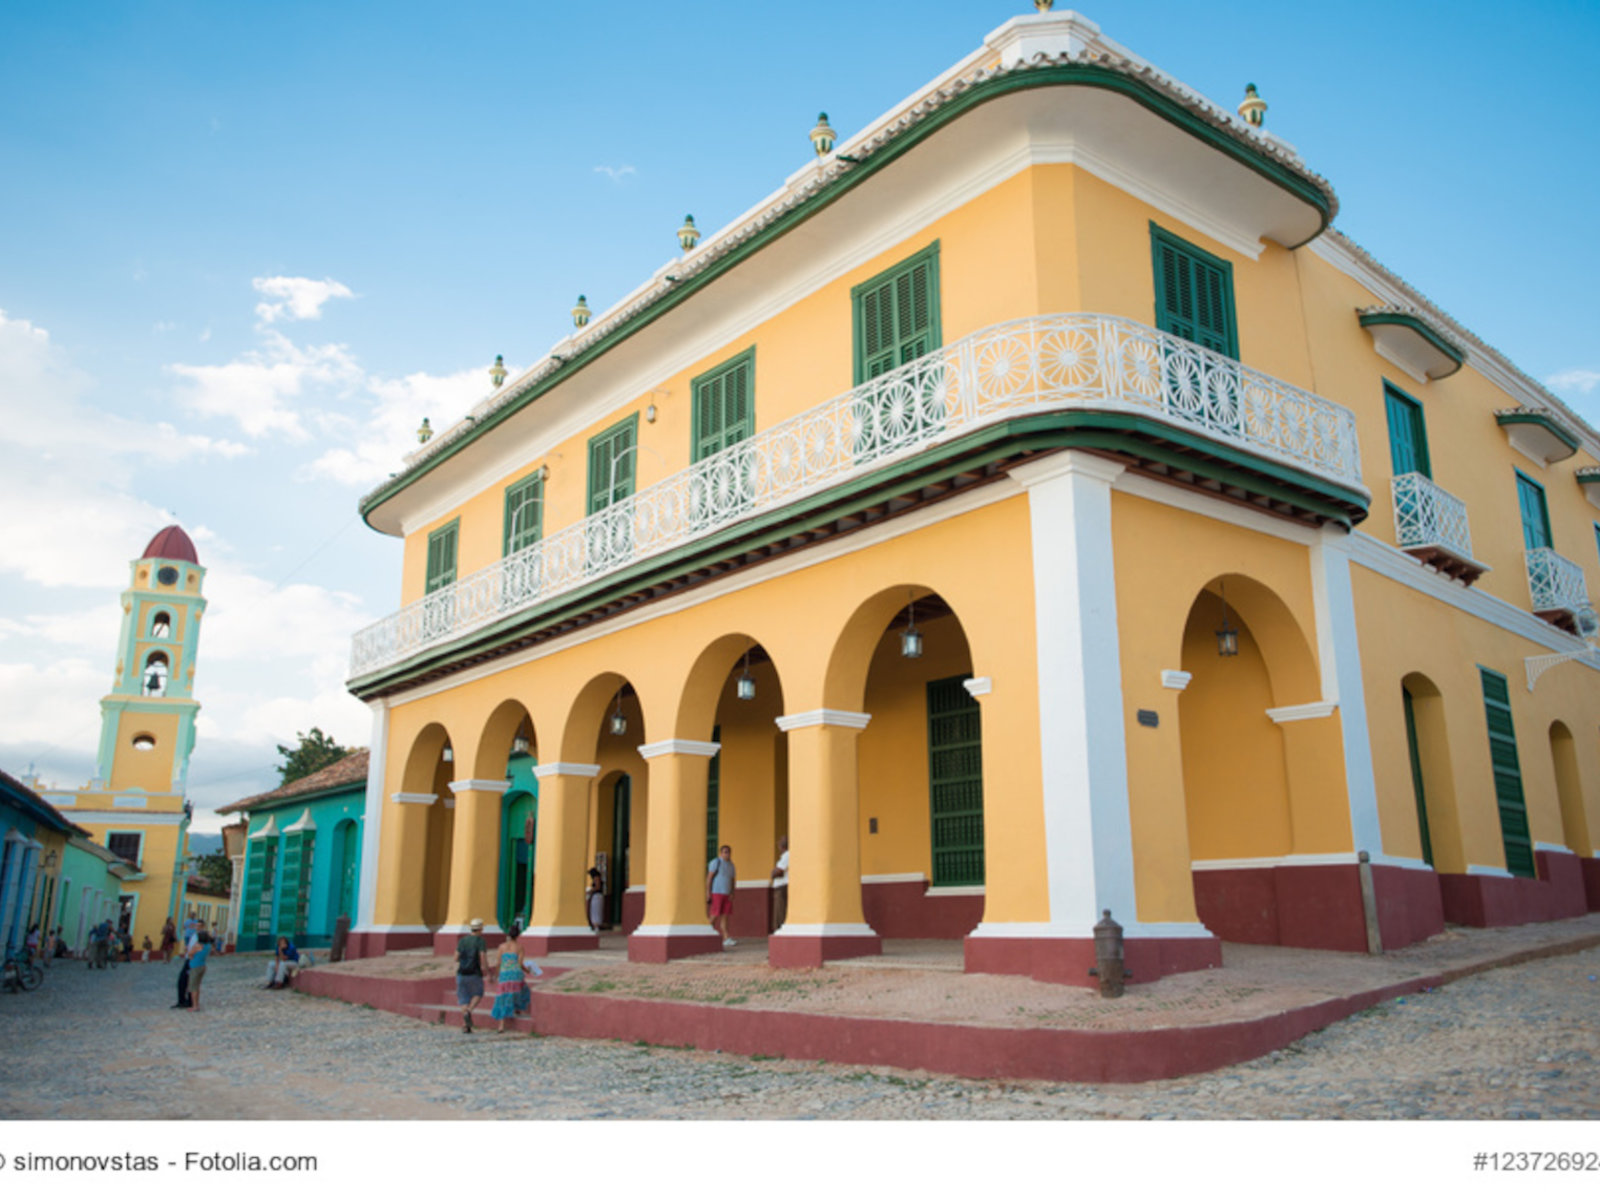 Trinidad©simonovstas-Fotolia.com